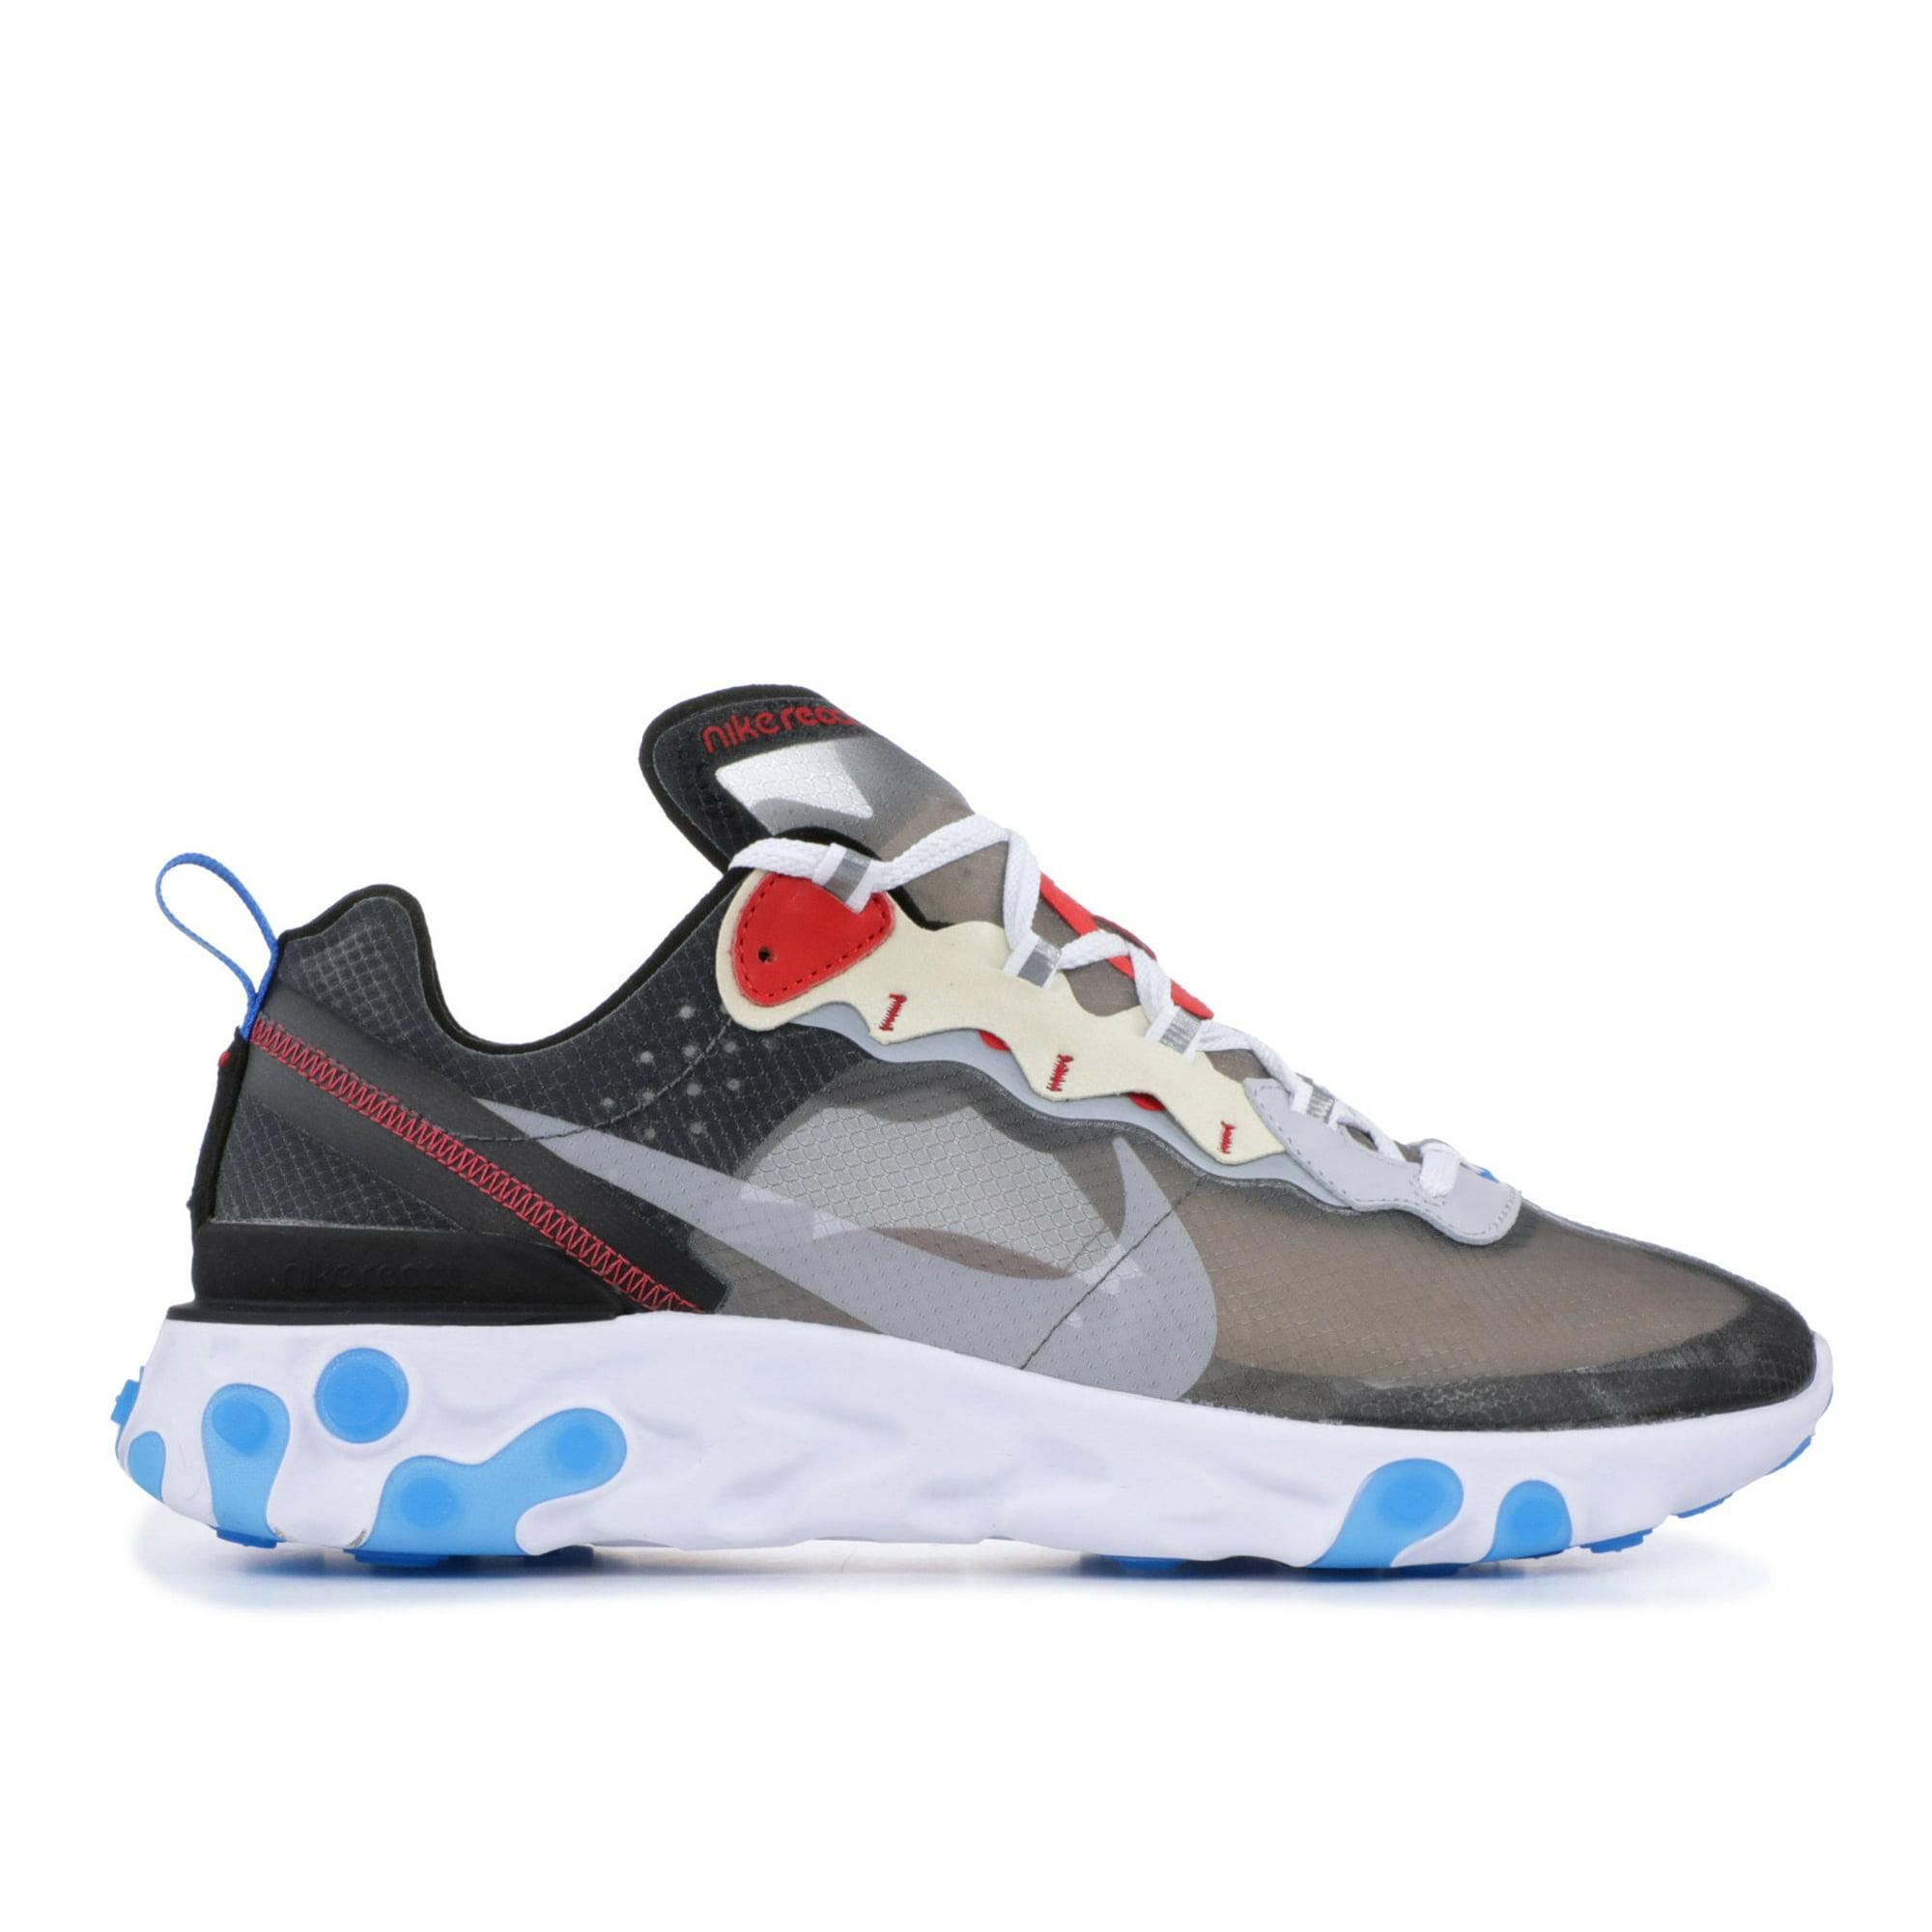 promo code 4c0ca 9d642 Nike - Men - Nike React Element 87 - Aq1090-003 - Size 10.5